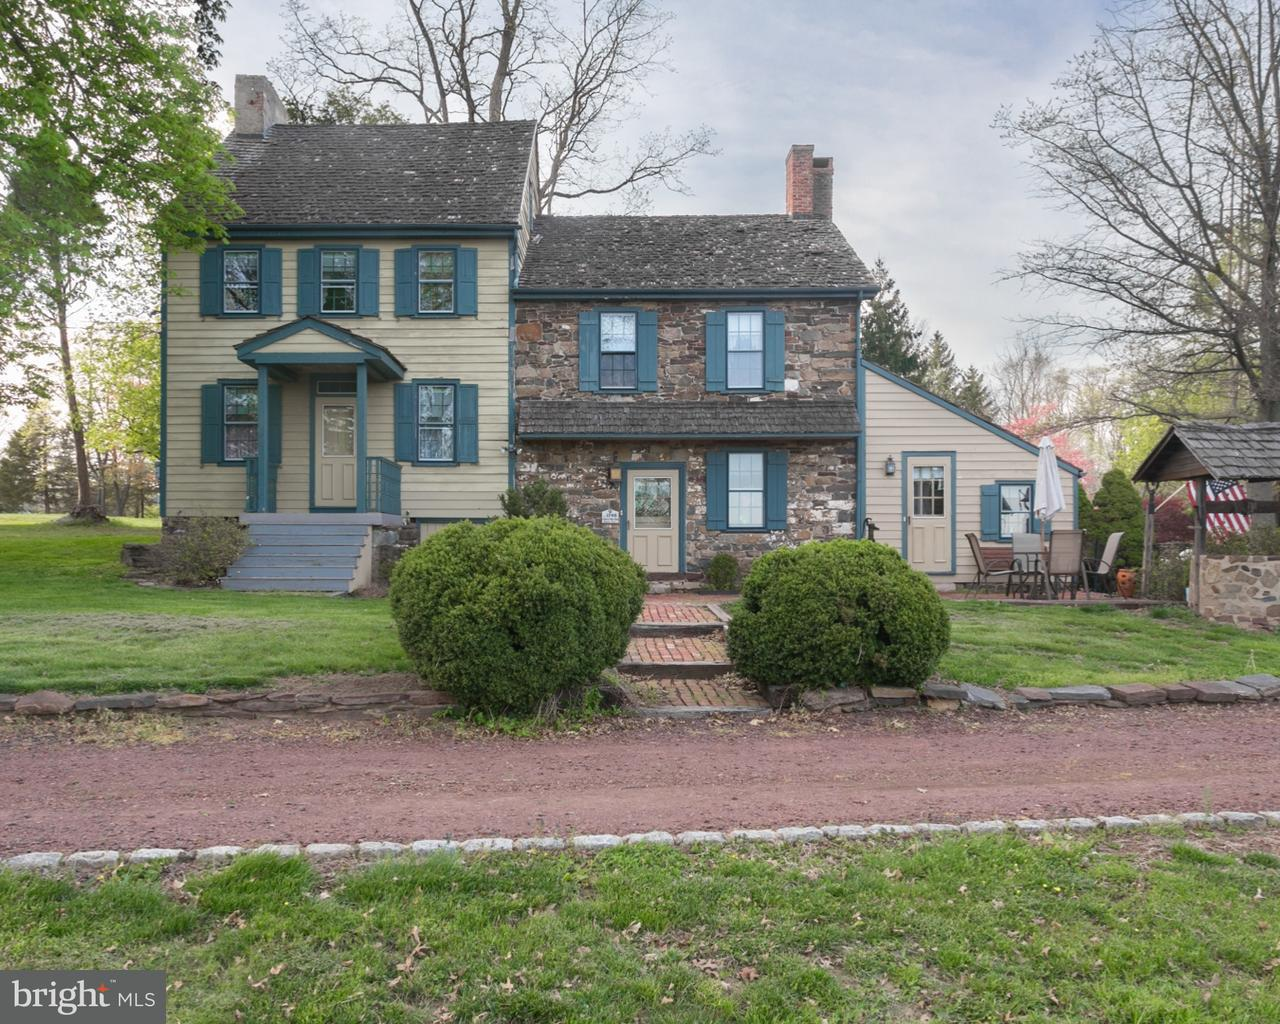 Casa Unifamiliar por un Venta en 1258 BEAR TAVERN Road Titusville, Nueva Jersey 08560 Estados UnidosEn/Alrededor: Hopewell Township